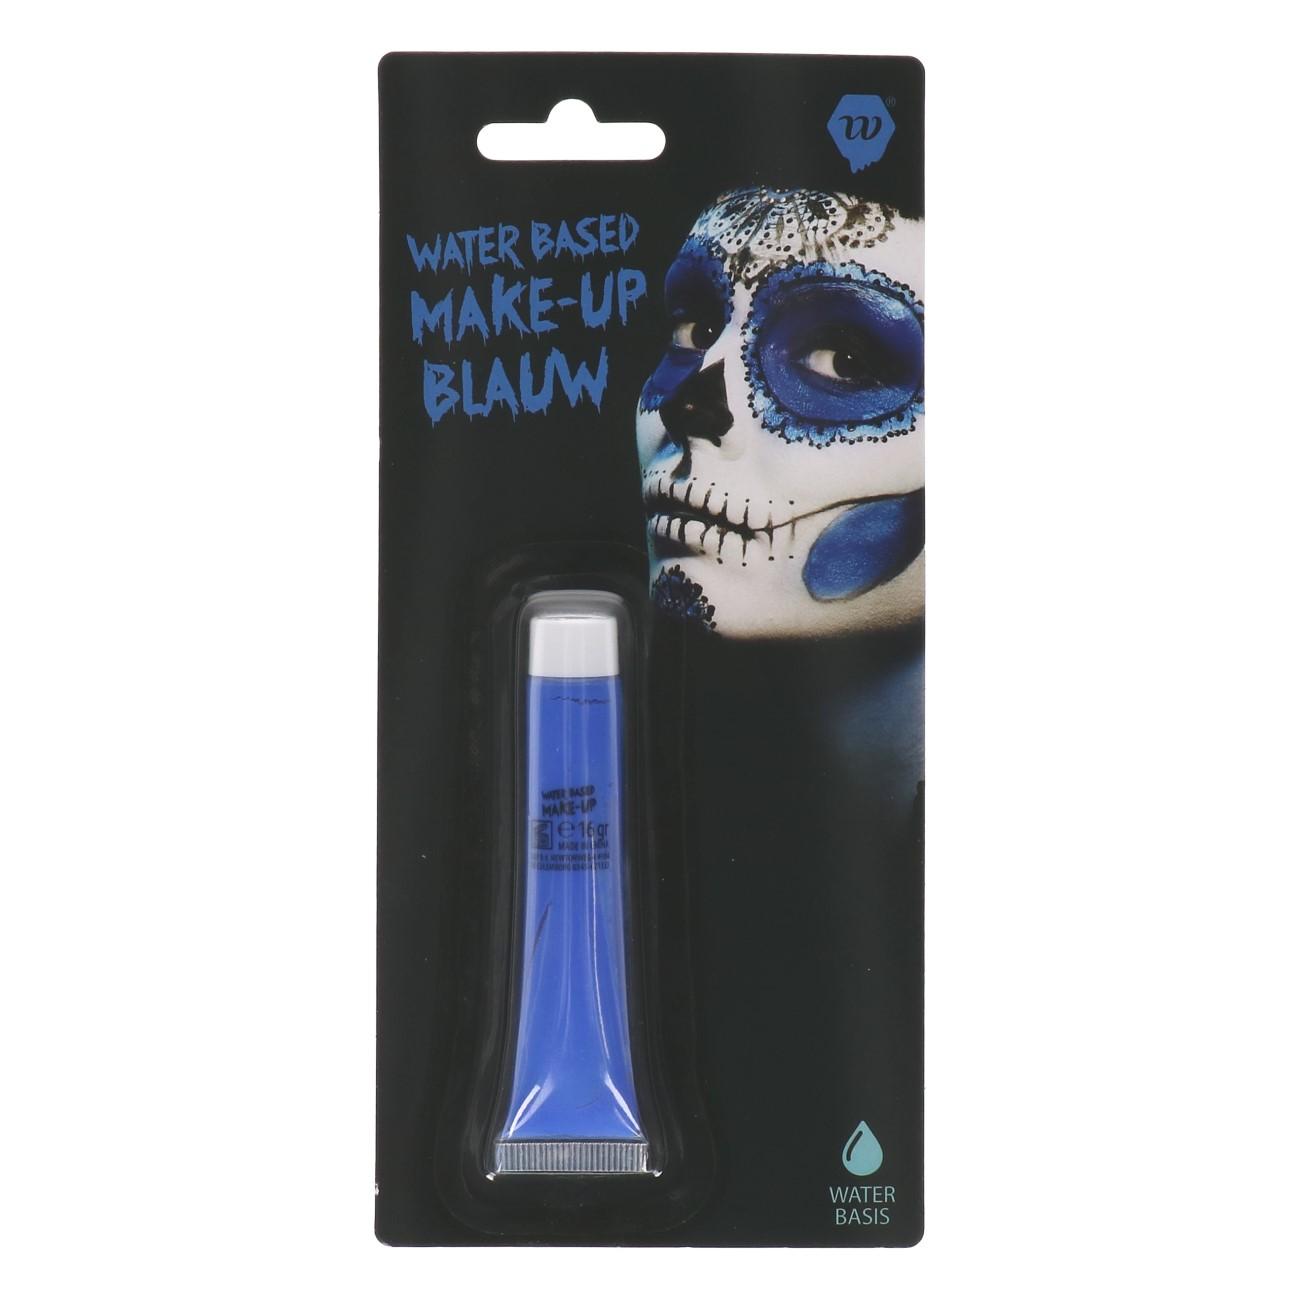 Water-Based Make-up Blauw Wauwfactor